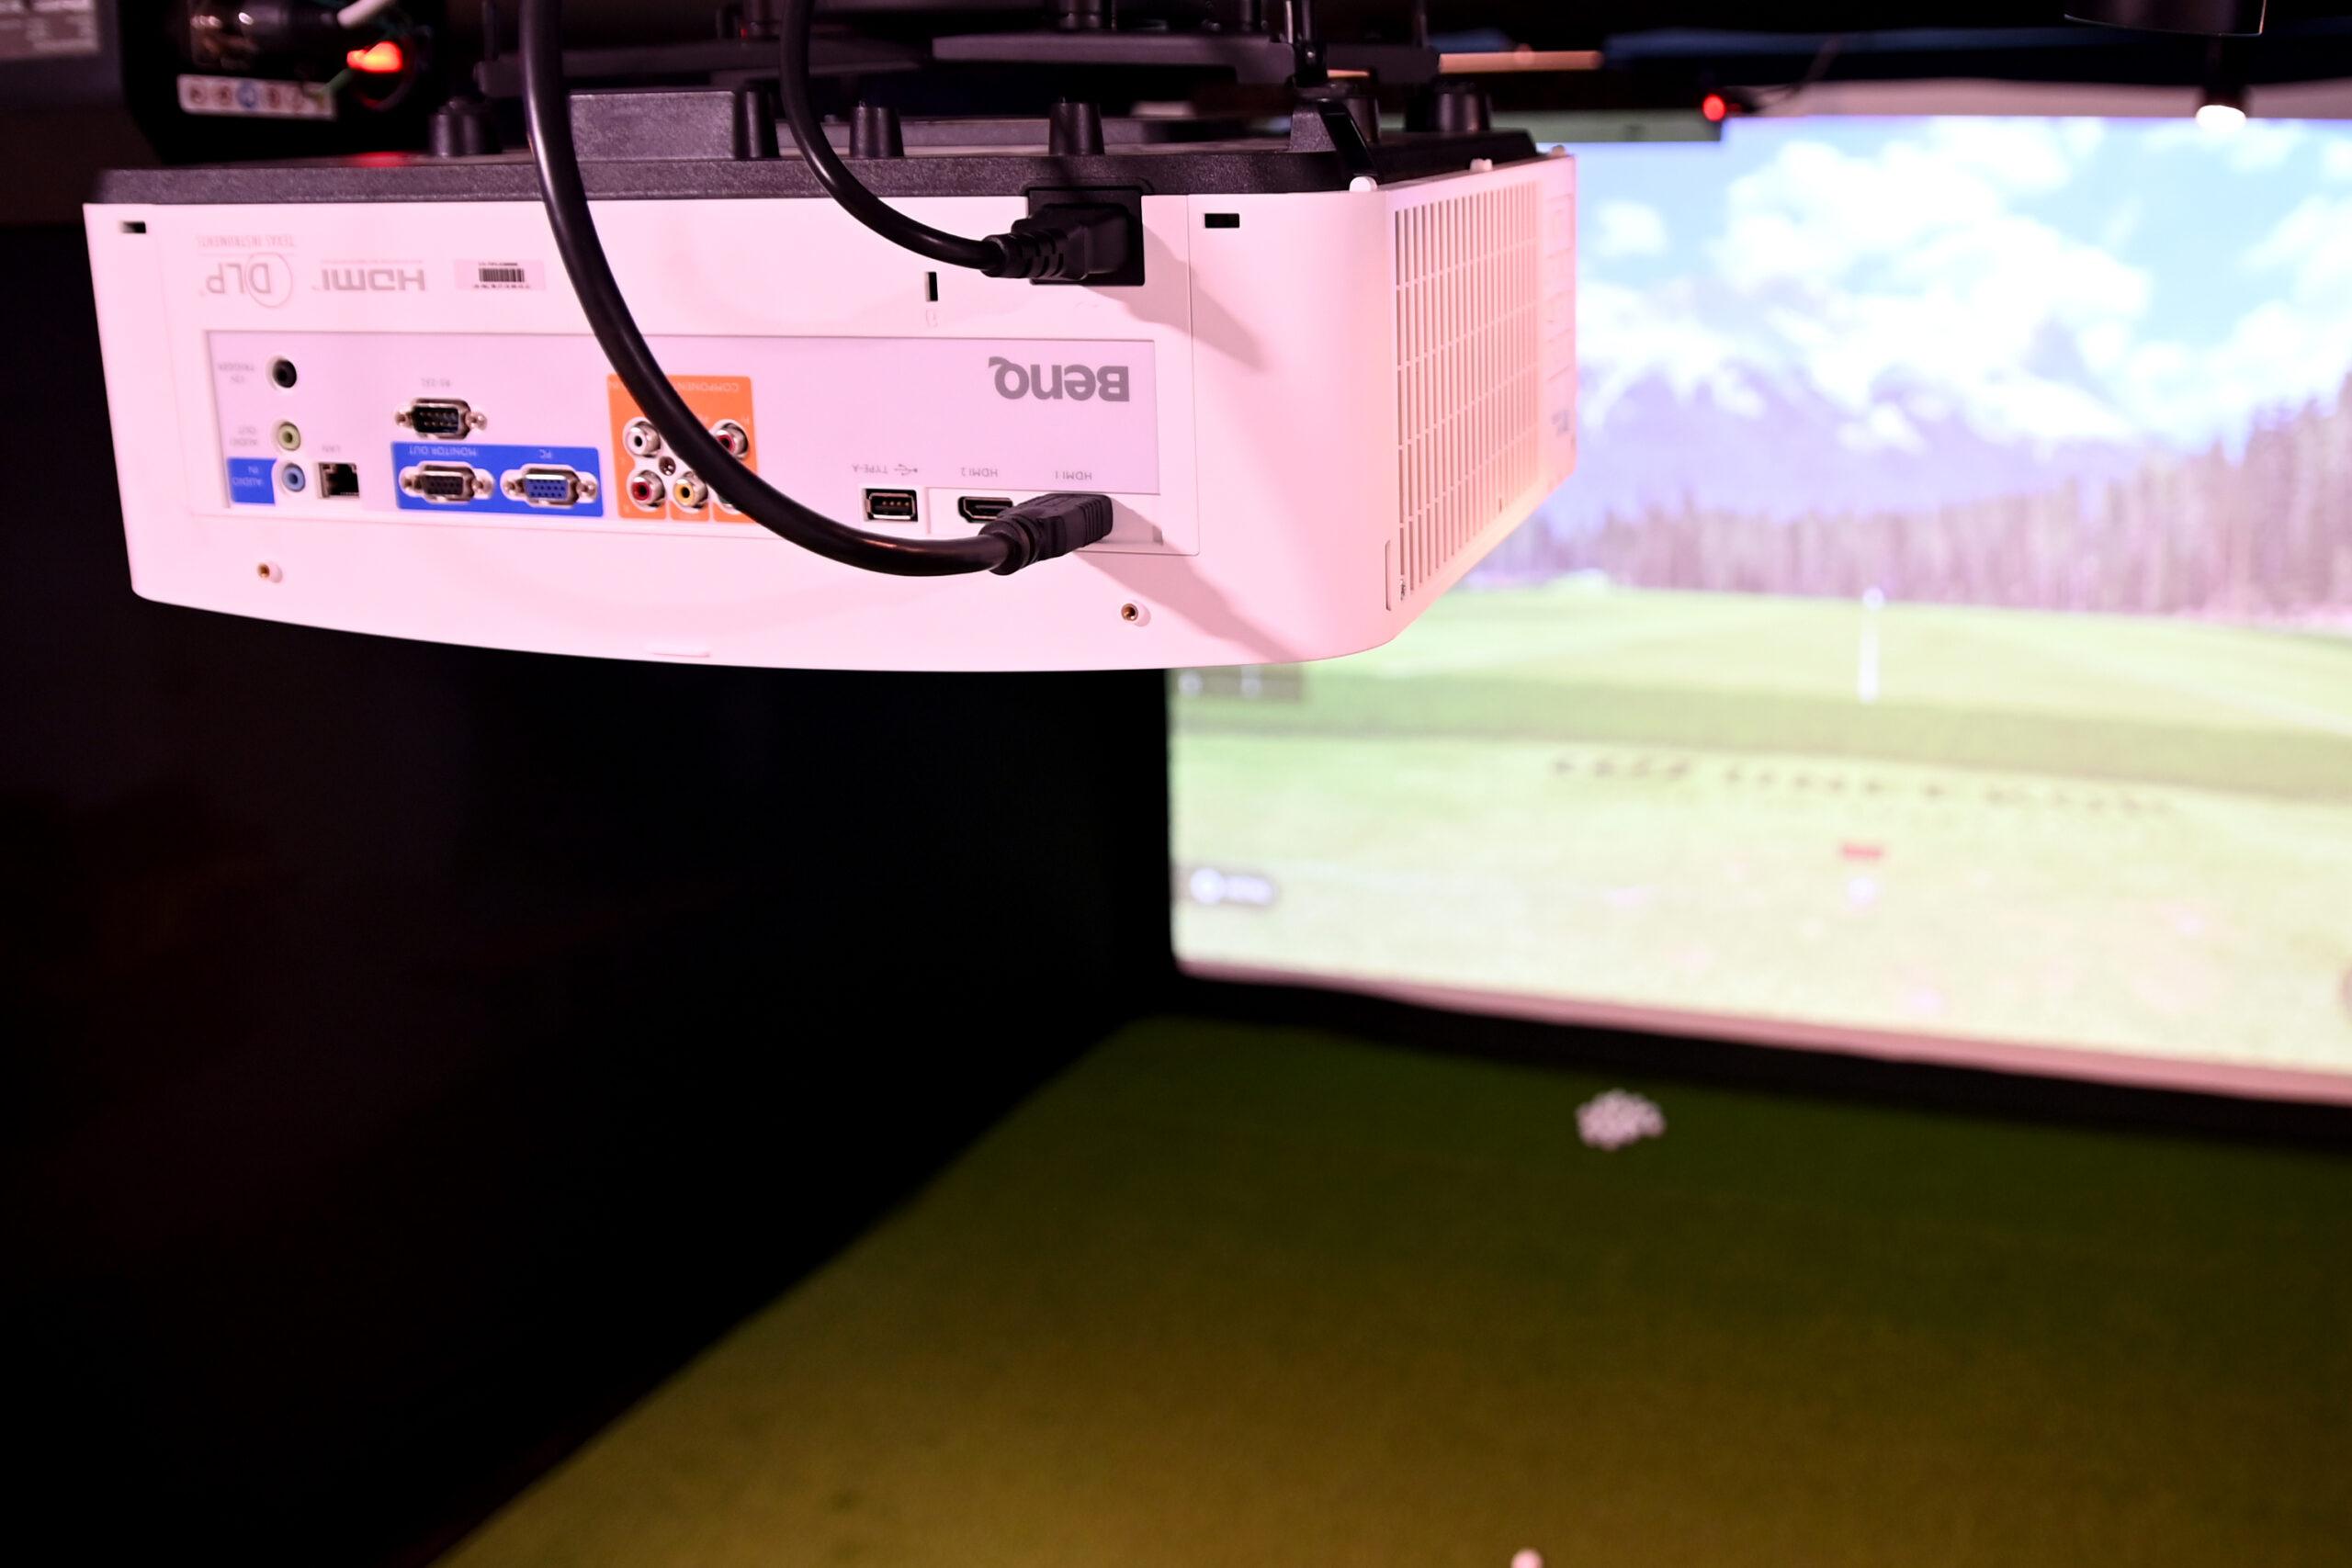 Golf Simulator Projector Set Up